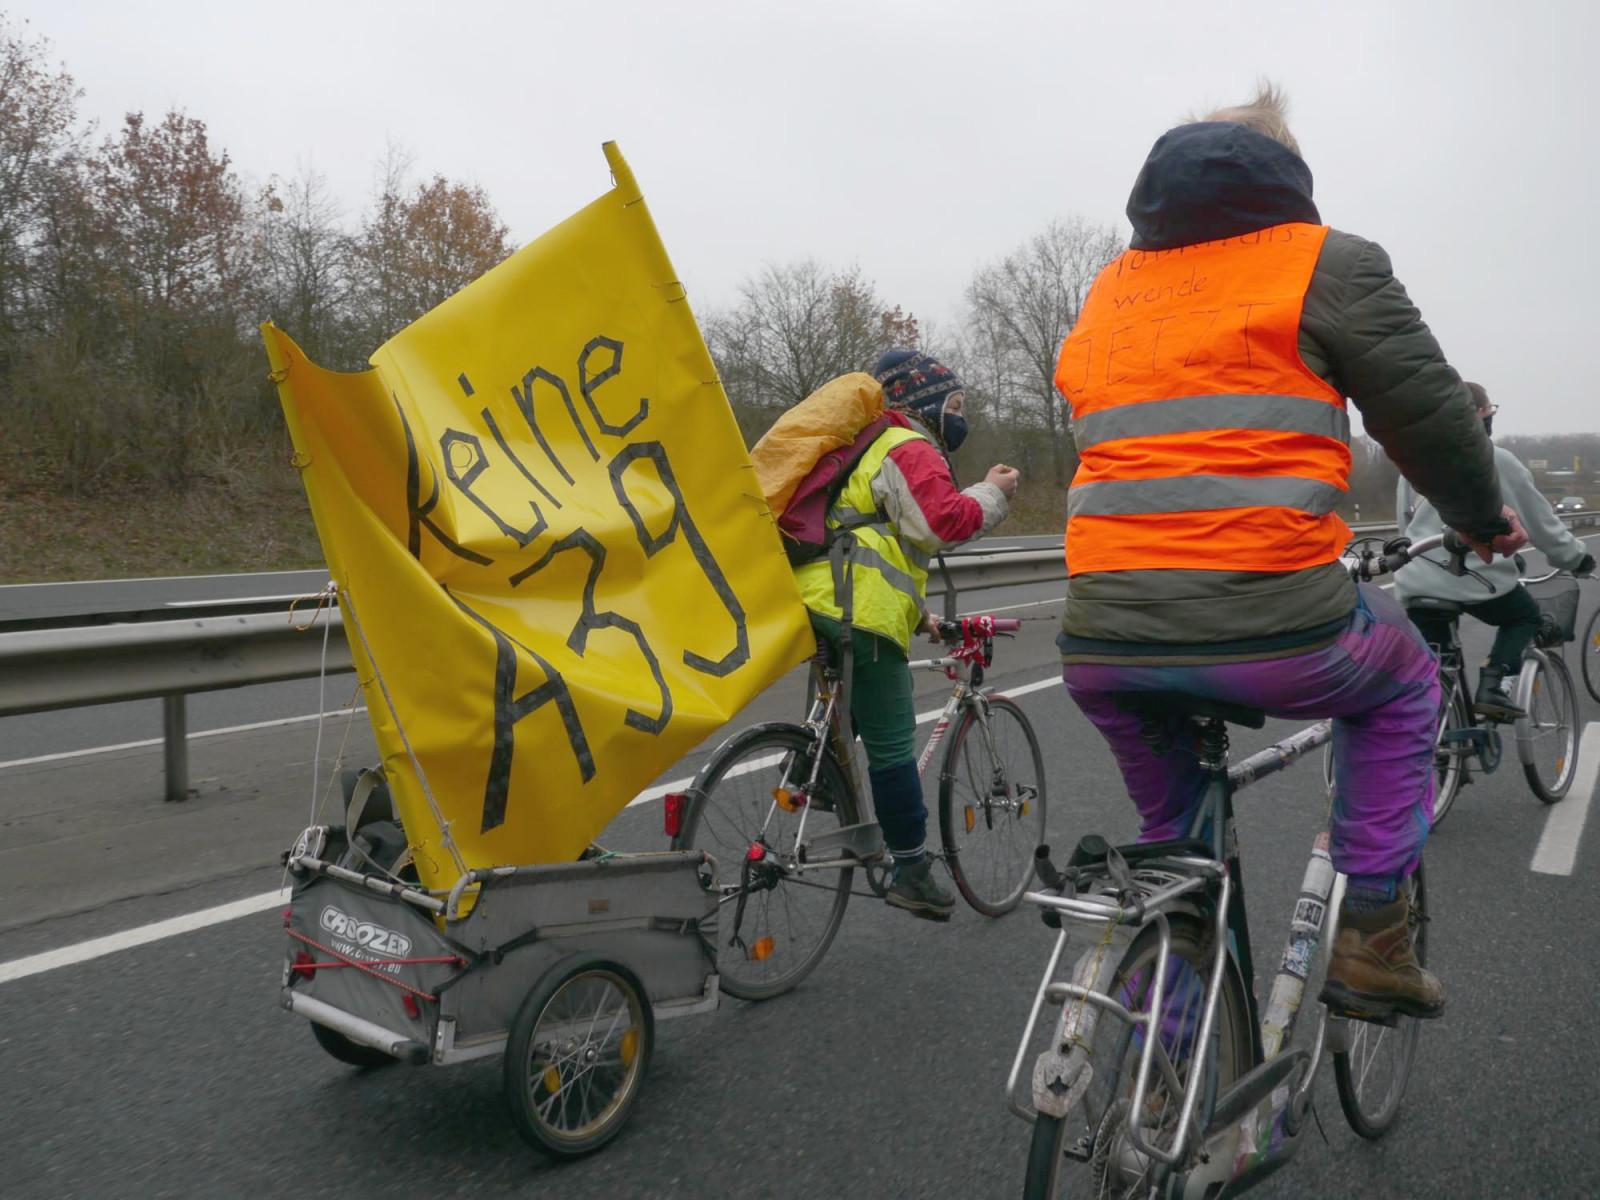 Autobahn-Fahrrad-Demo in Lüneburg